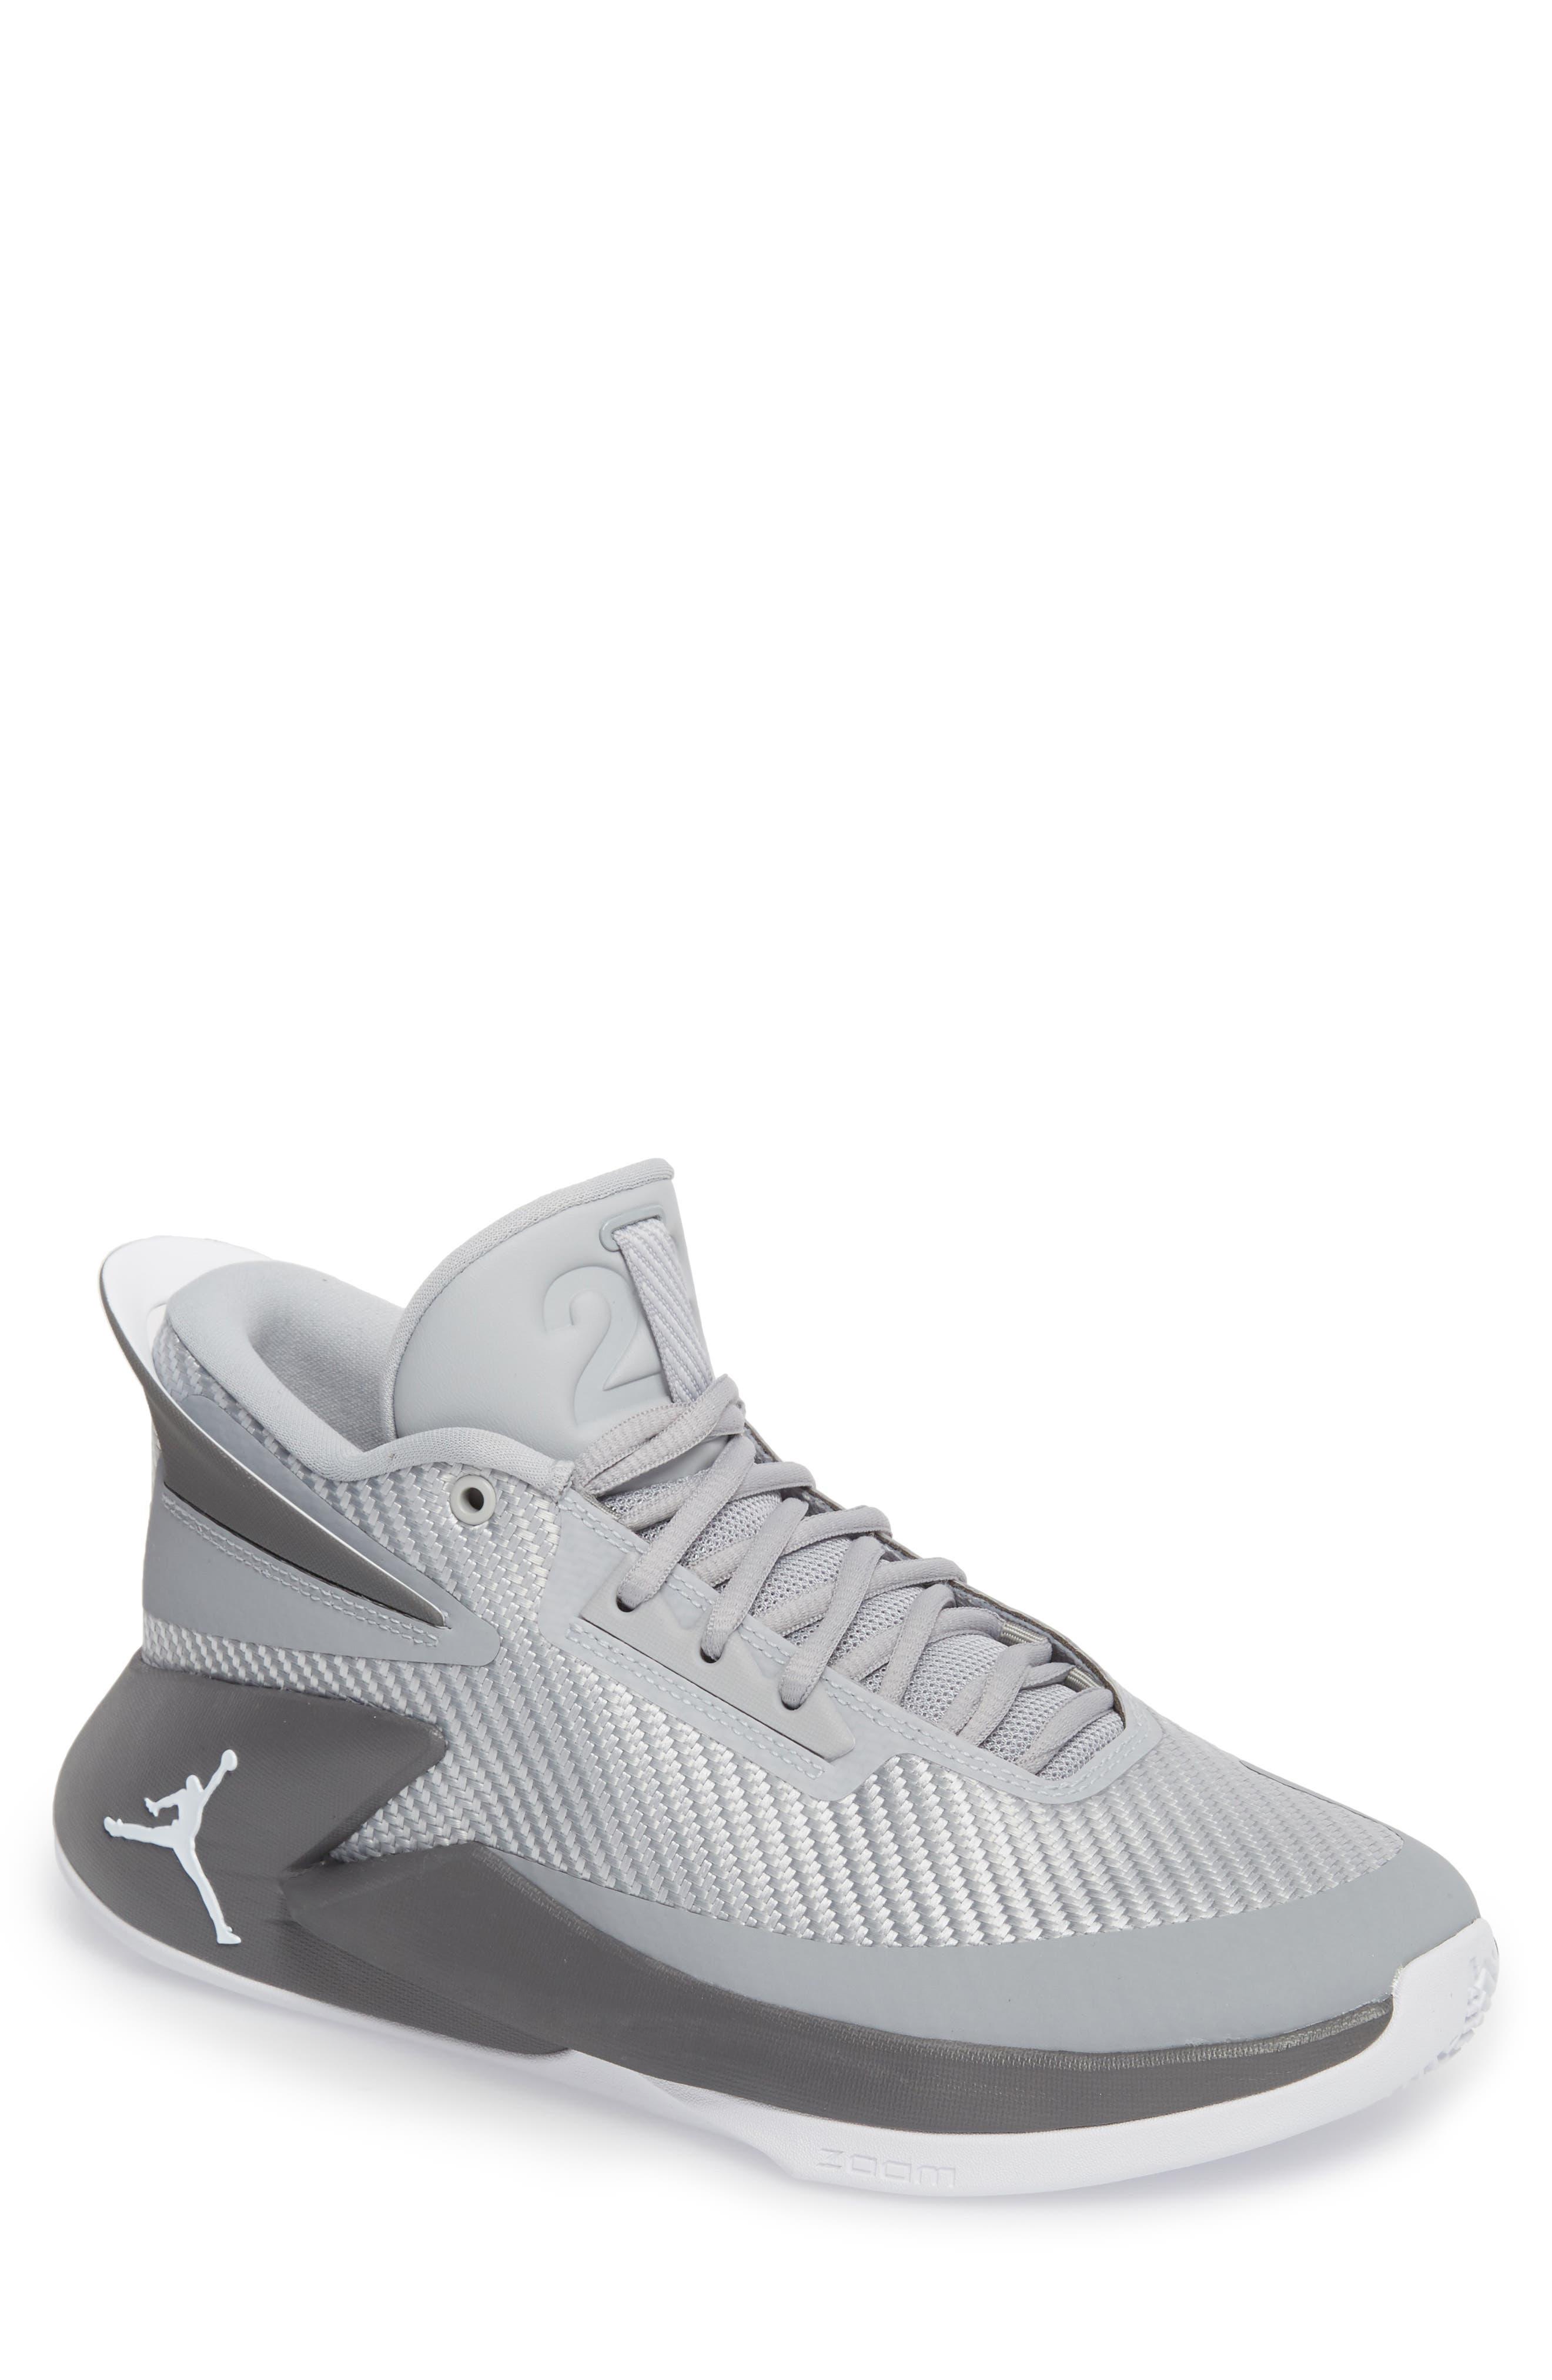 Jordan Fly Lockdown Sneaker,                         Main,                         color, Wolf Grey/ White/ Dark Grey